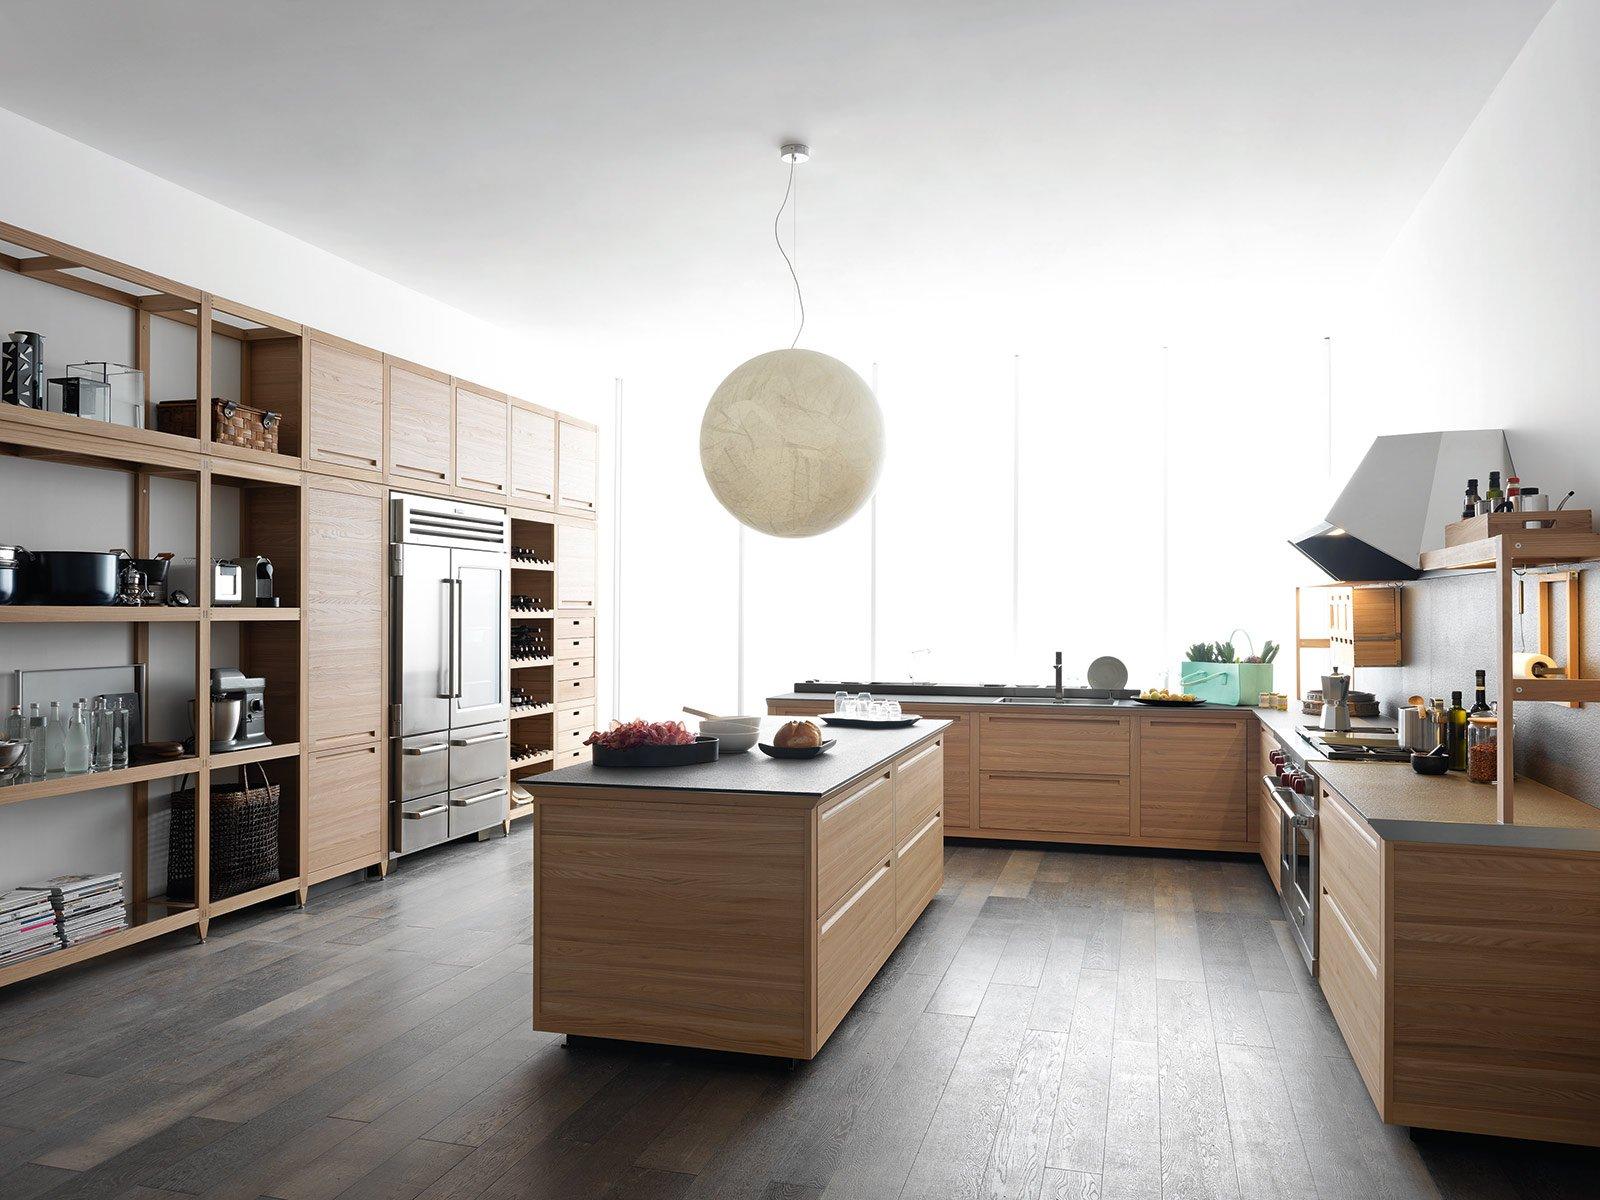 Amato Cucine moderne in legno - Cose di Casa ML49